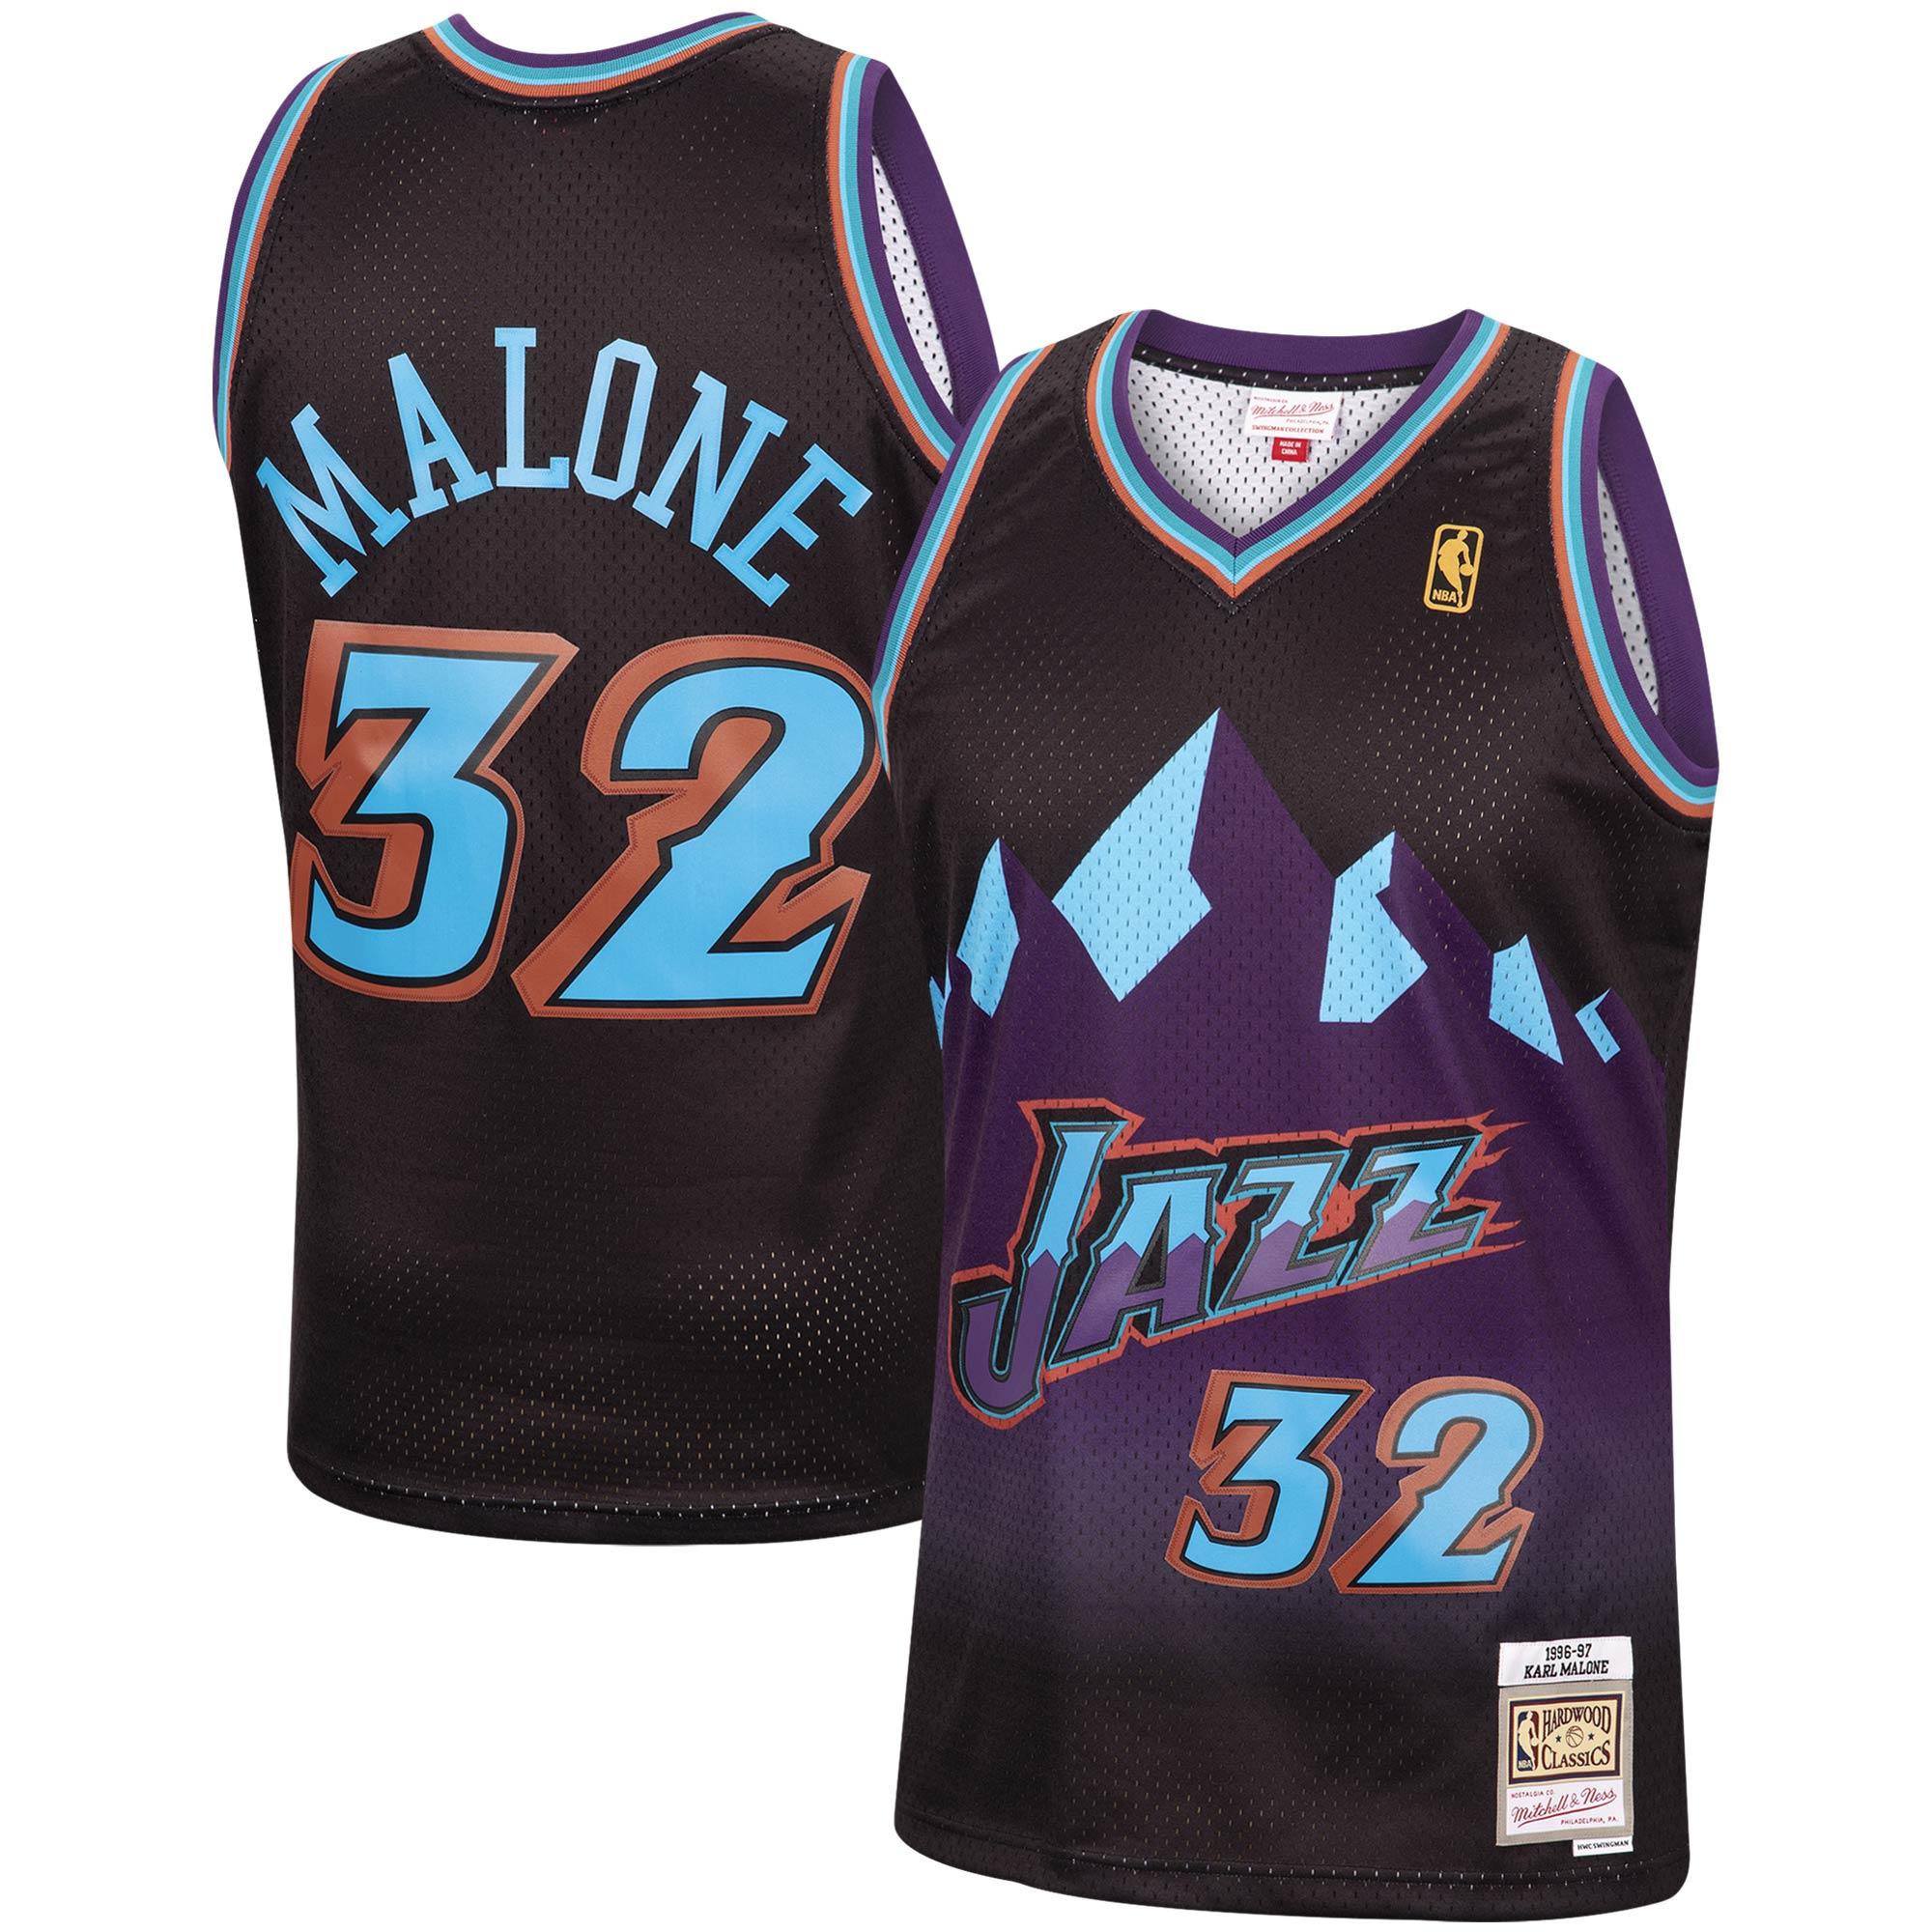 Karl Malone Utah Jazz Mitchell & Ness 1996-97 Hardwood Classics Reload Swingman Jersey - Black